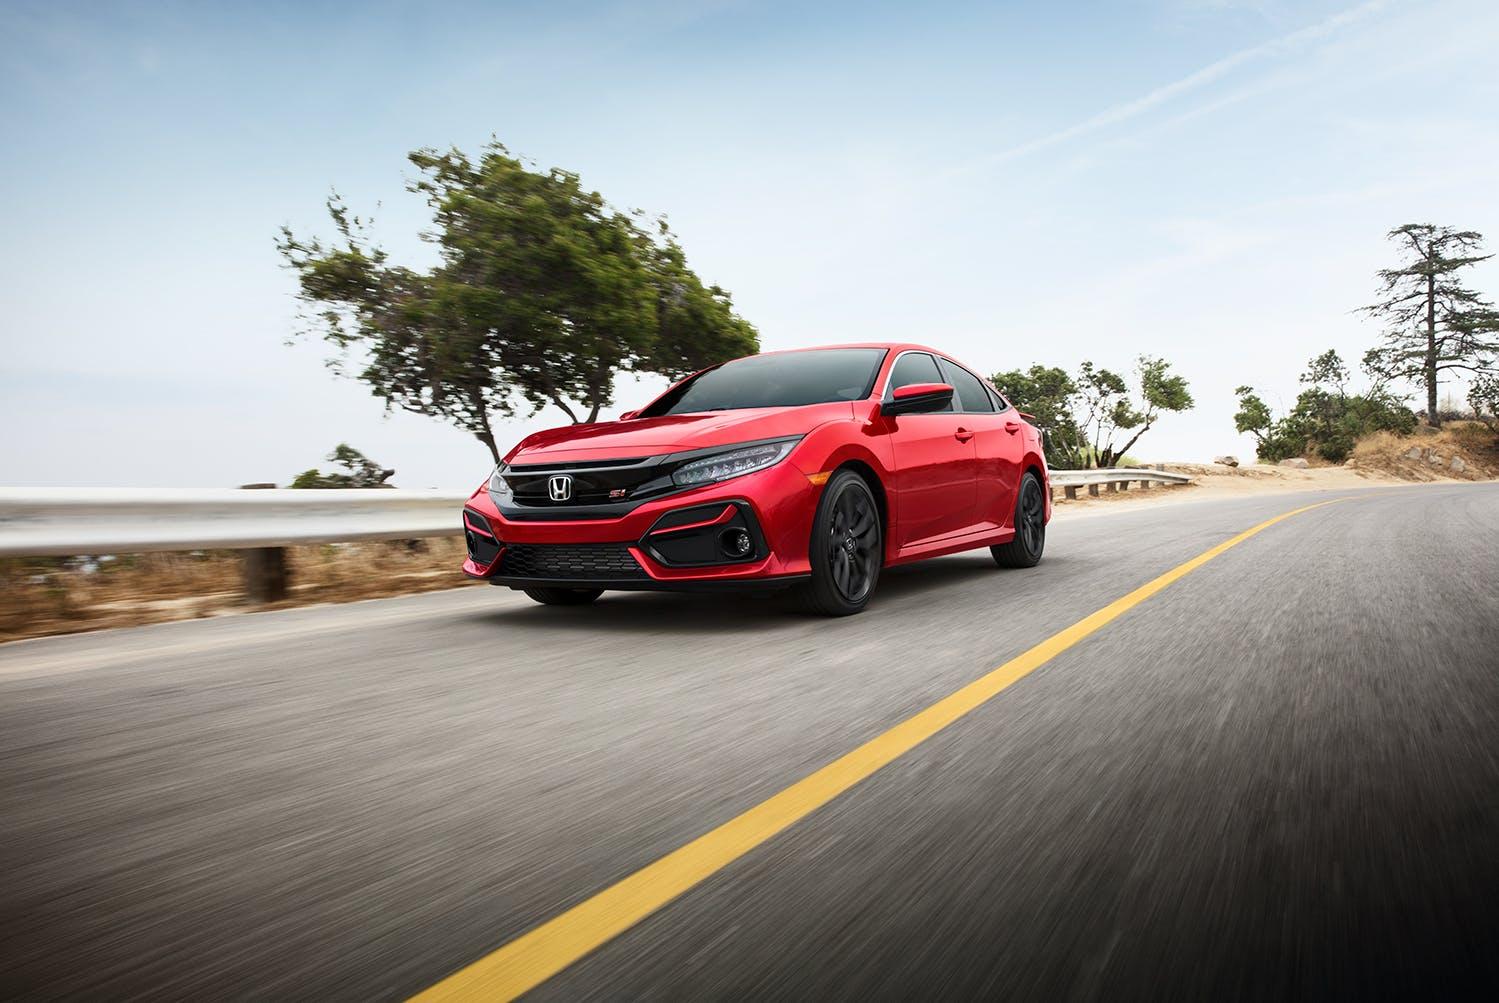 Washington Honda is a Honda Dealership near Arden, PA | Red 2020 Honda Civic sedan driving down road